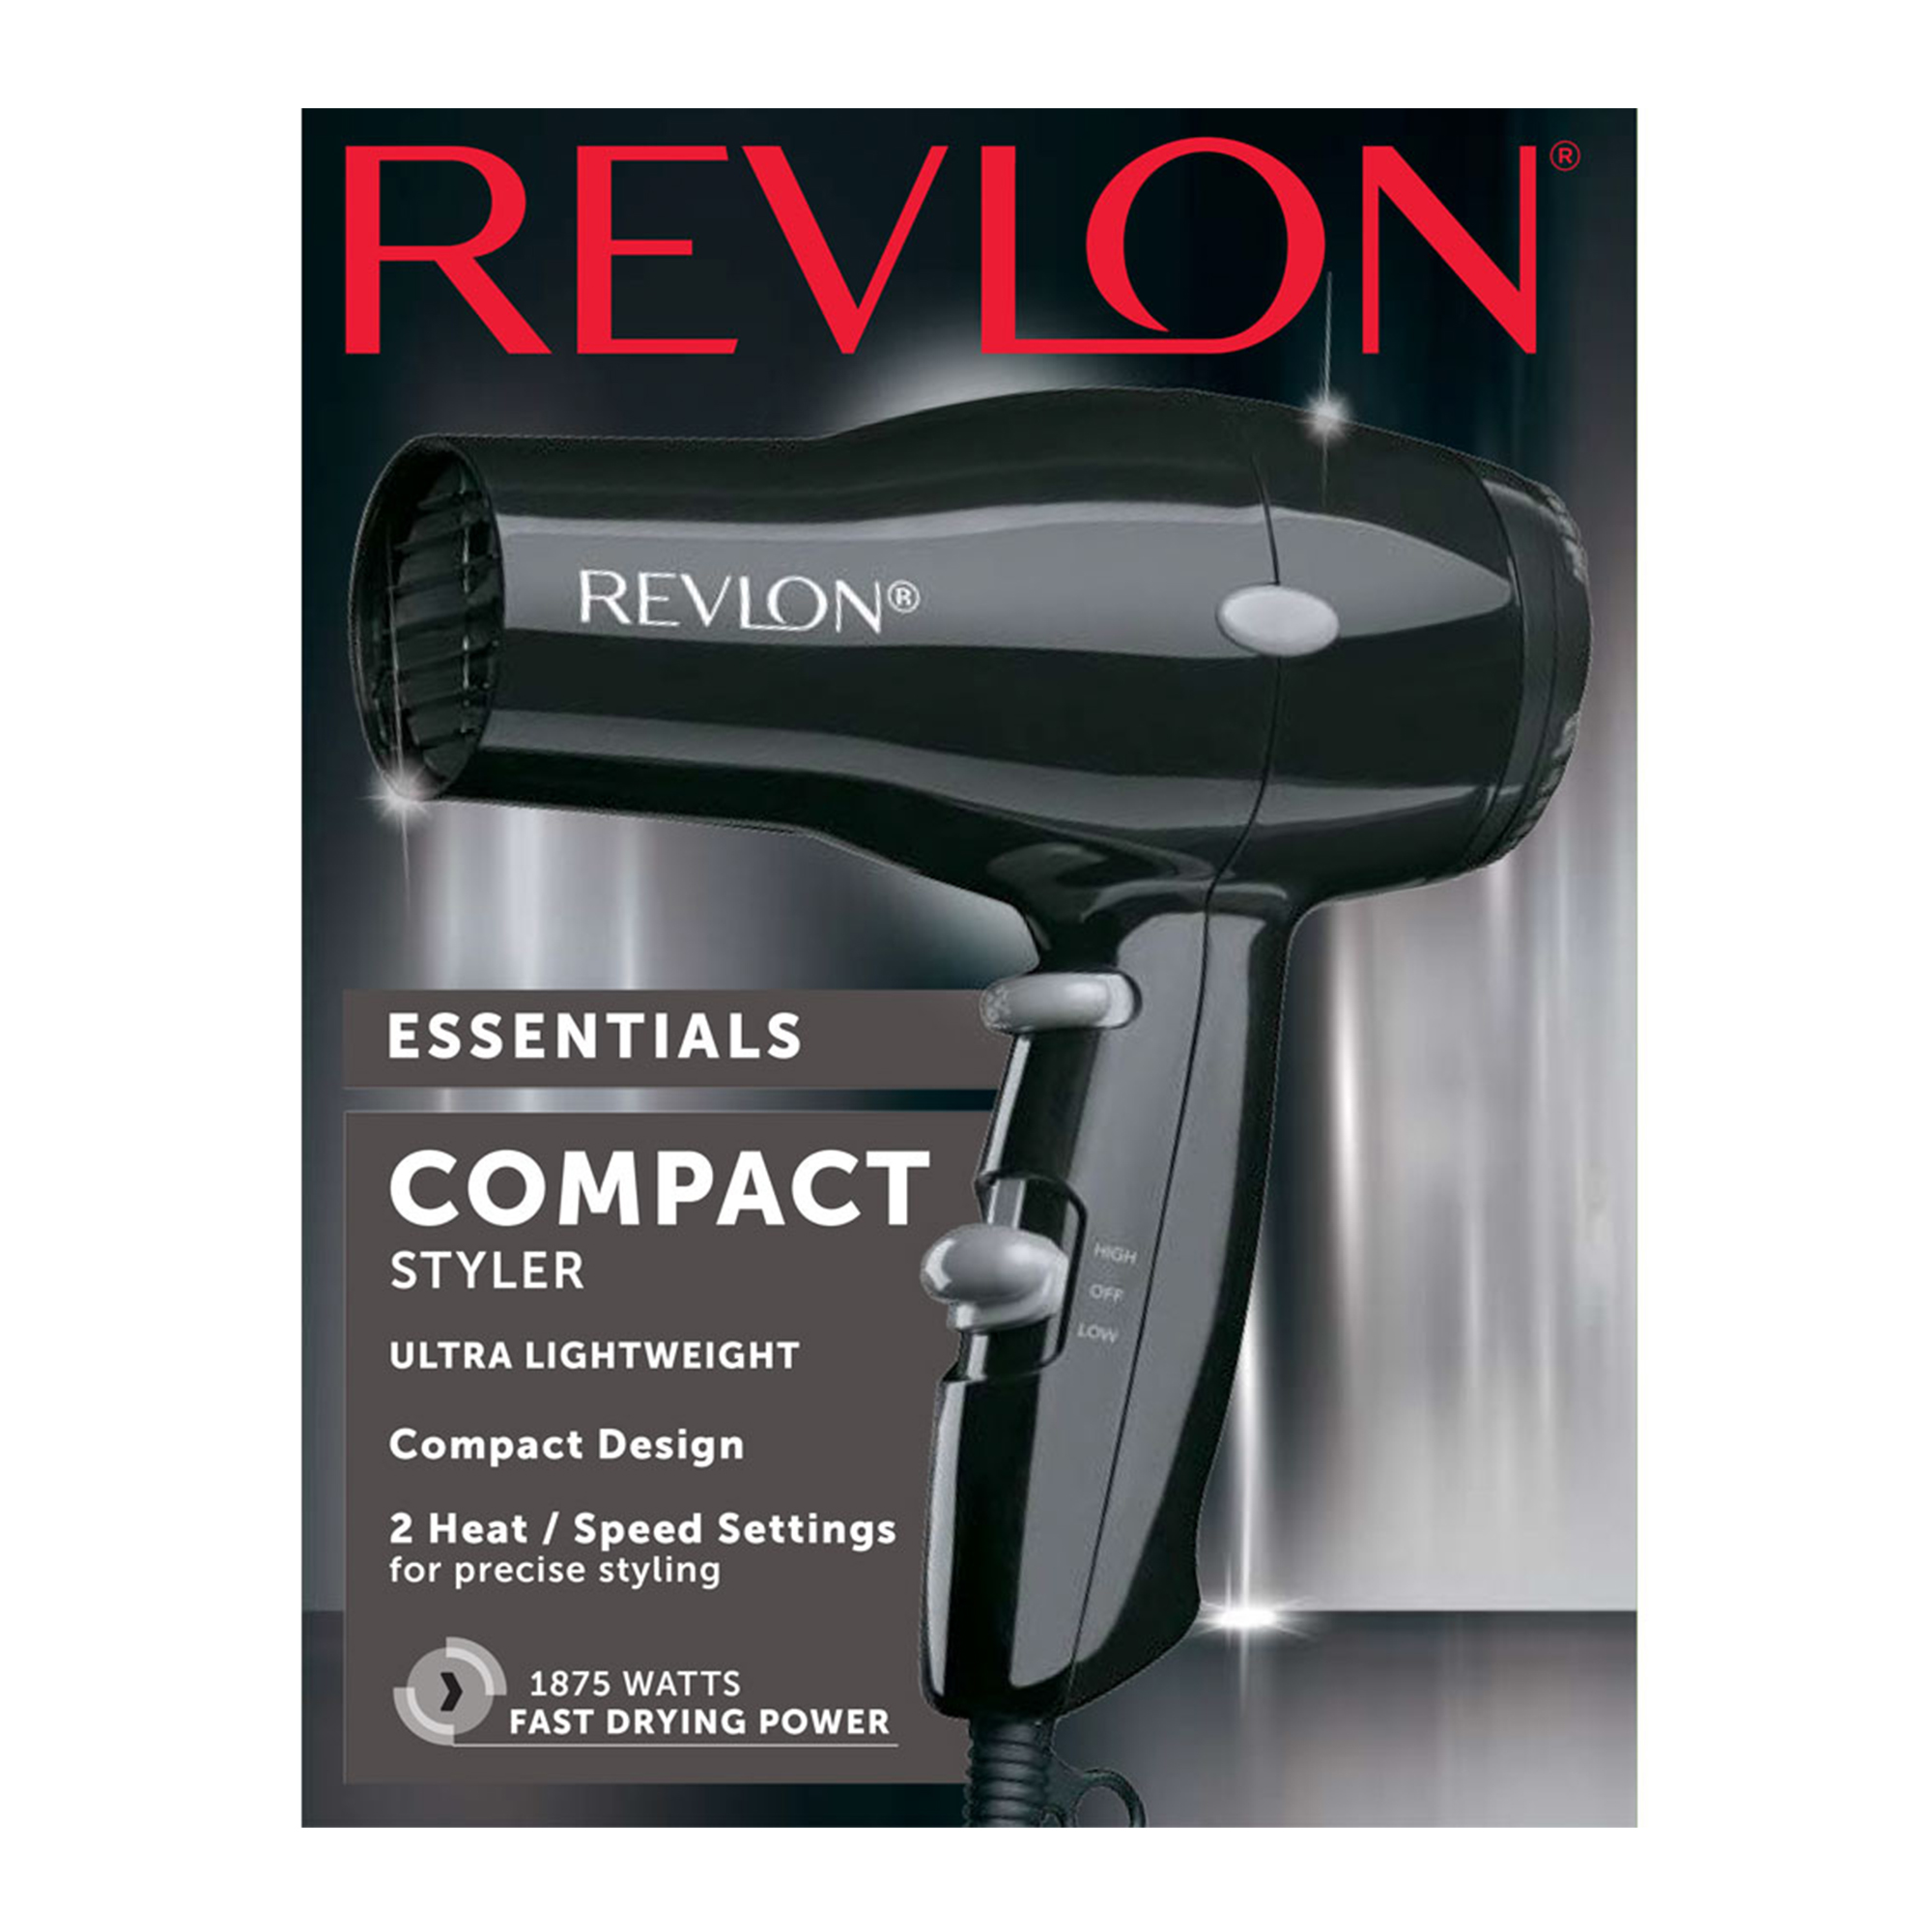 Revlon Essentials Compact Rvdr5034 1875w Hair Dryer Black Walmart Com